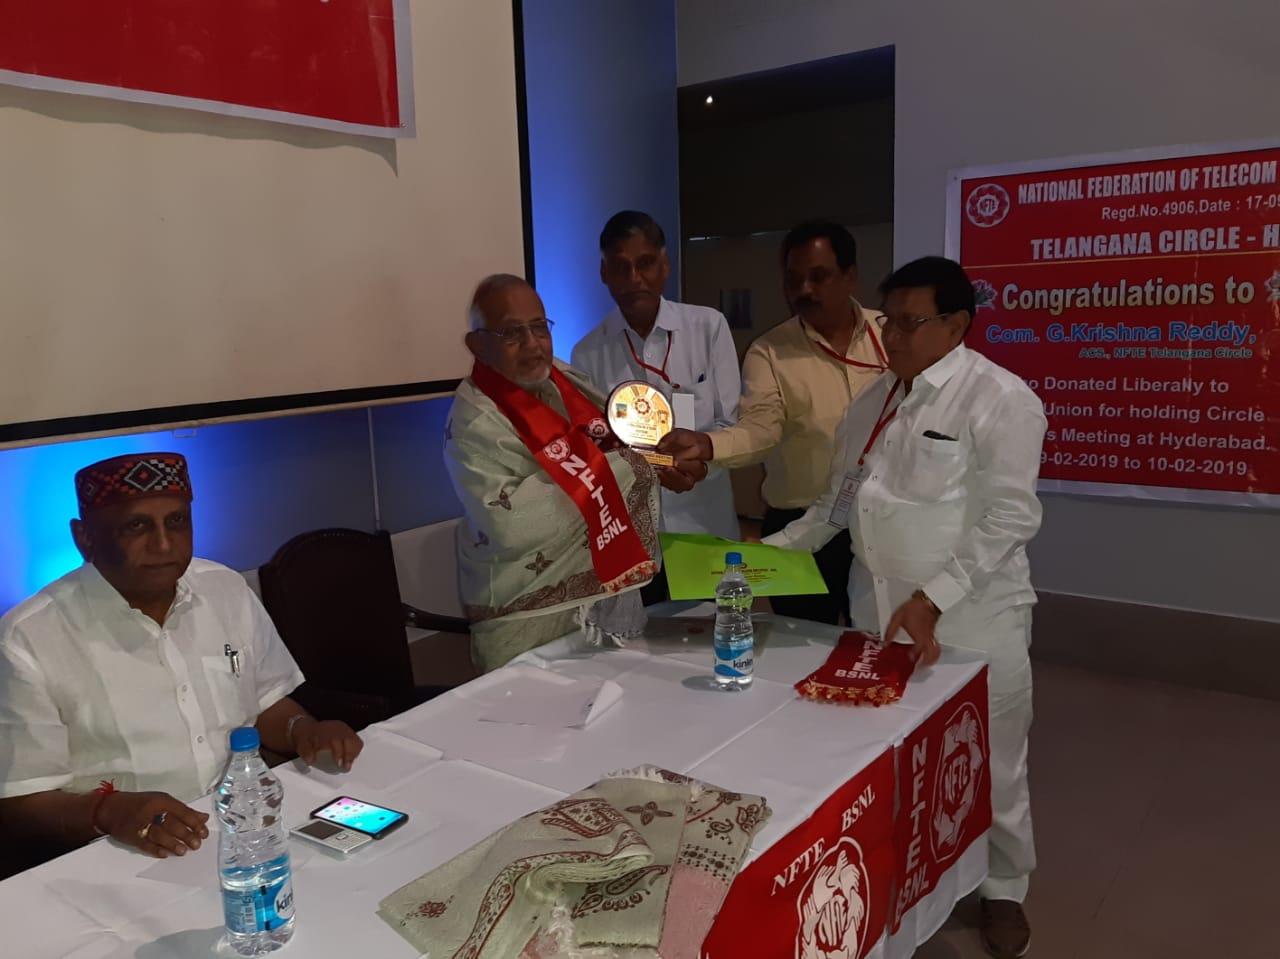 NFTE - BSNL Telangana